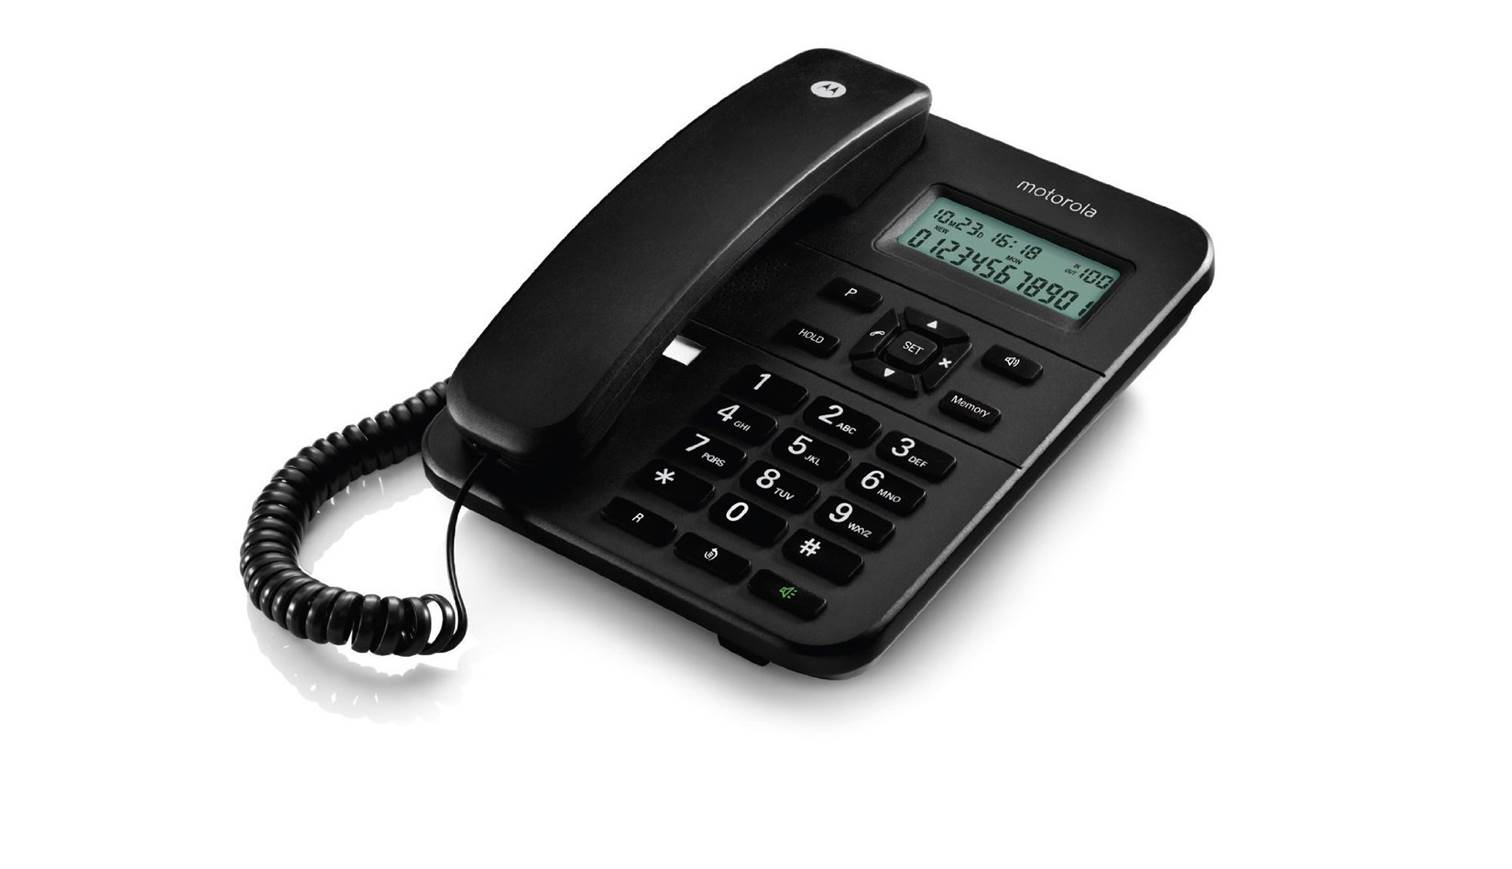 Motorola CT202 Corded Phone Harvey Norman Singapore : 61QEJEj0iOLp3ks mgSL1500 from www.harveynorman.com.sg size 1512 x 869 jpeg 59kB